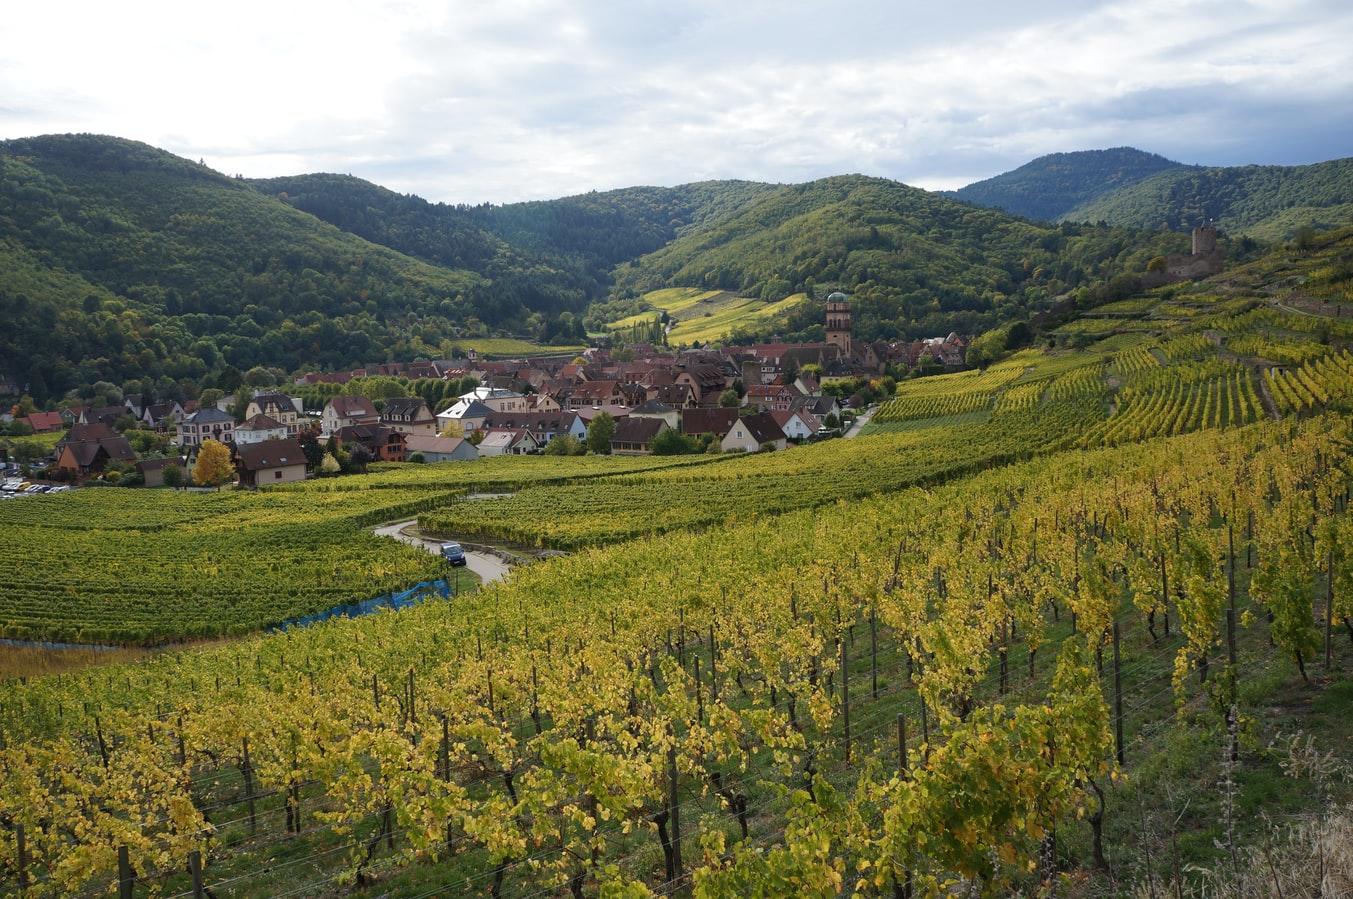 Village - Espace rural - Kaysersberg - France - SchoolMouv - Géographie - CM1